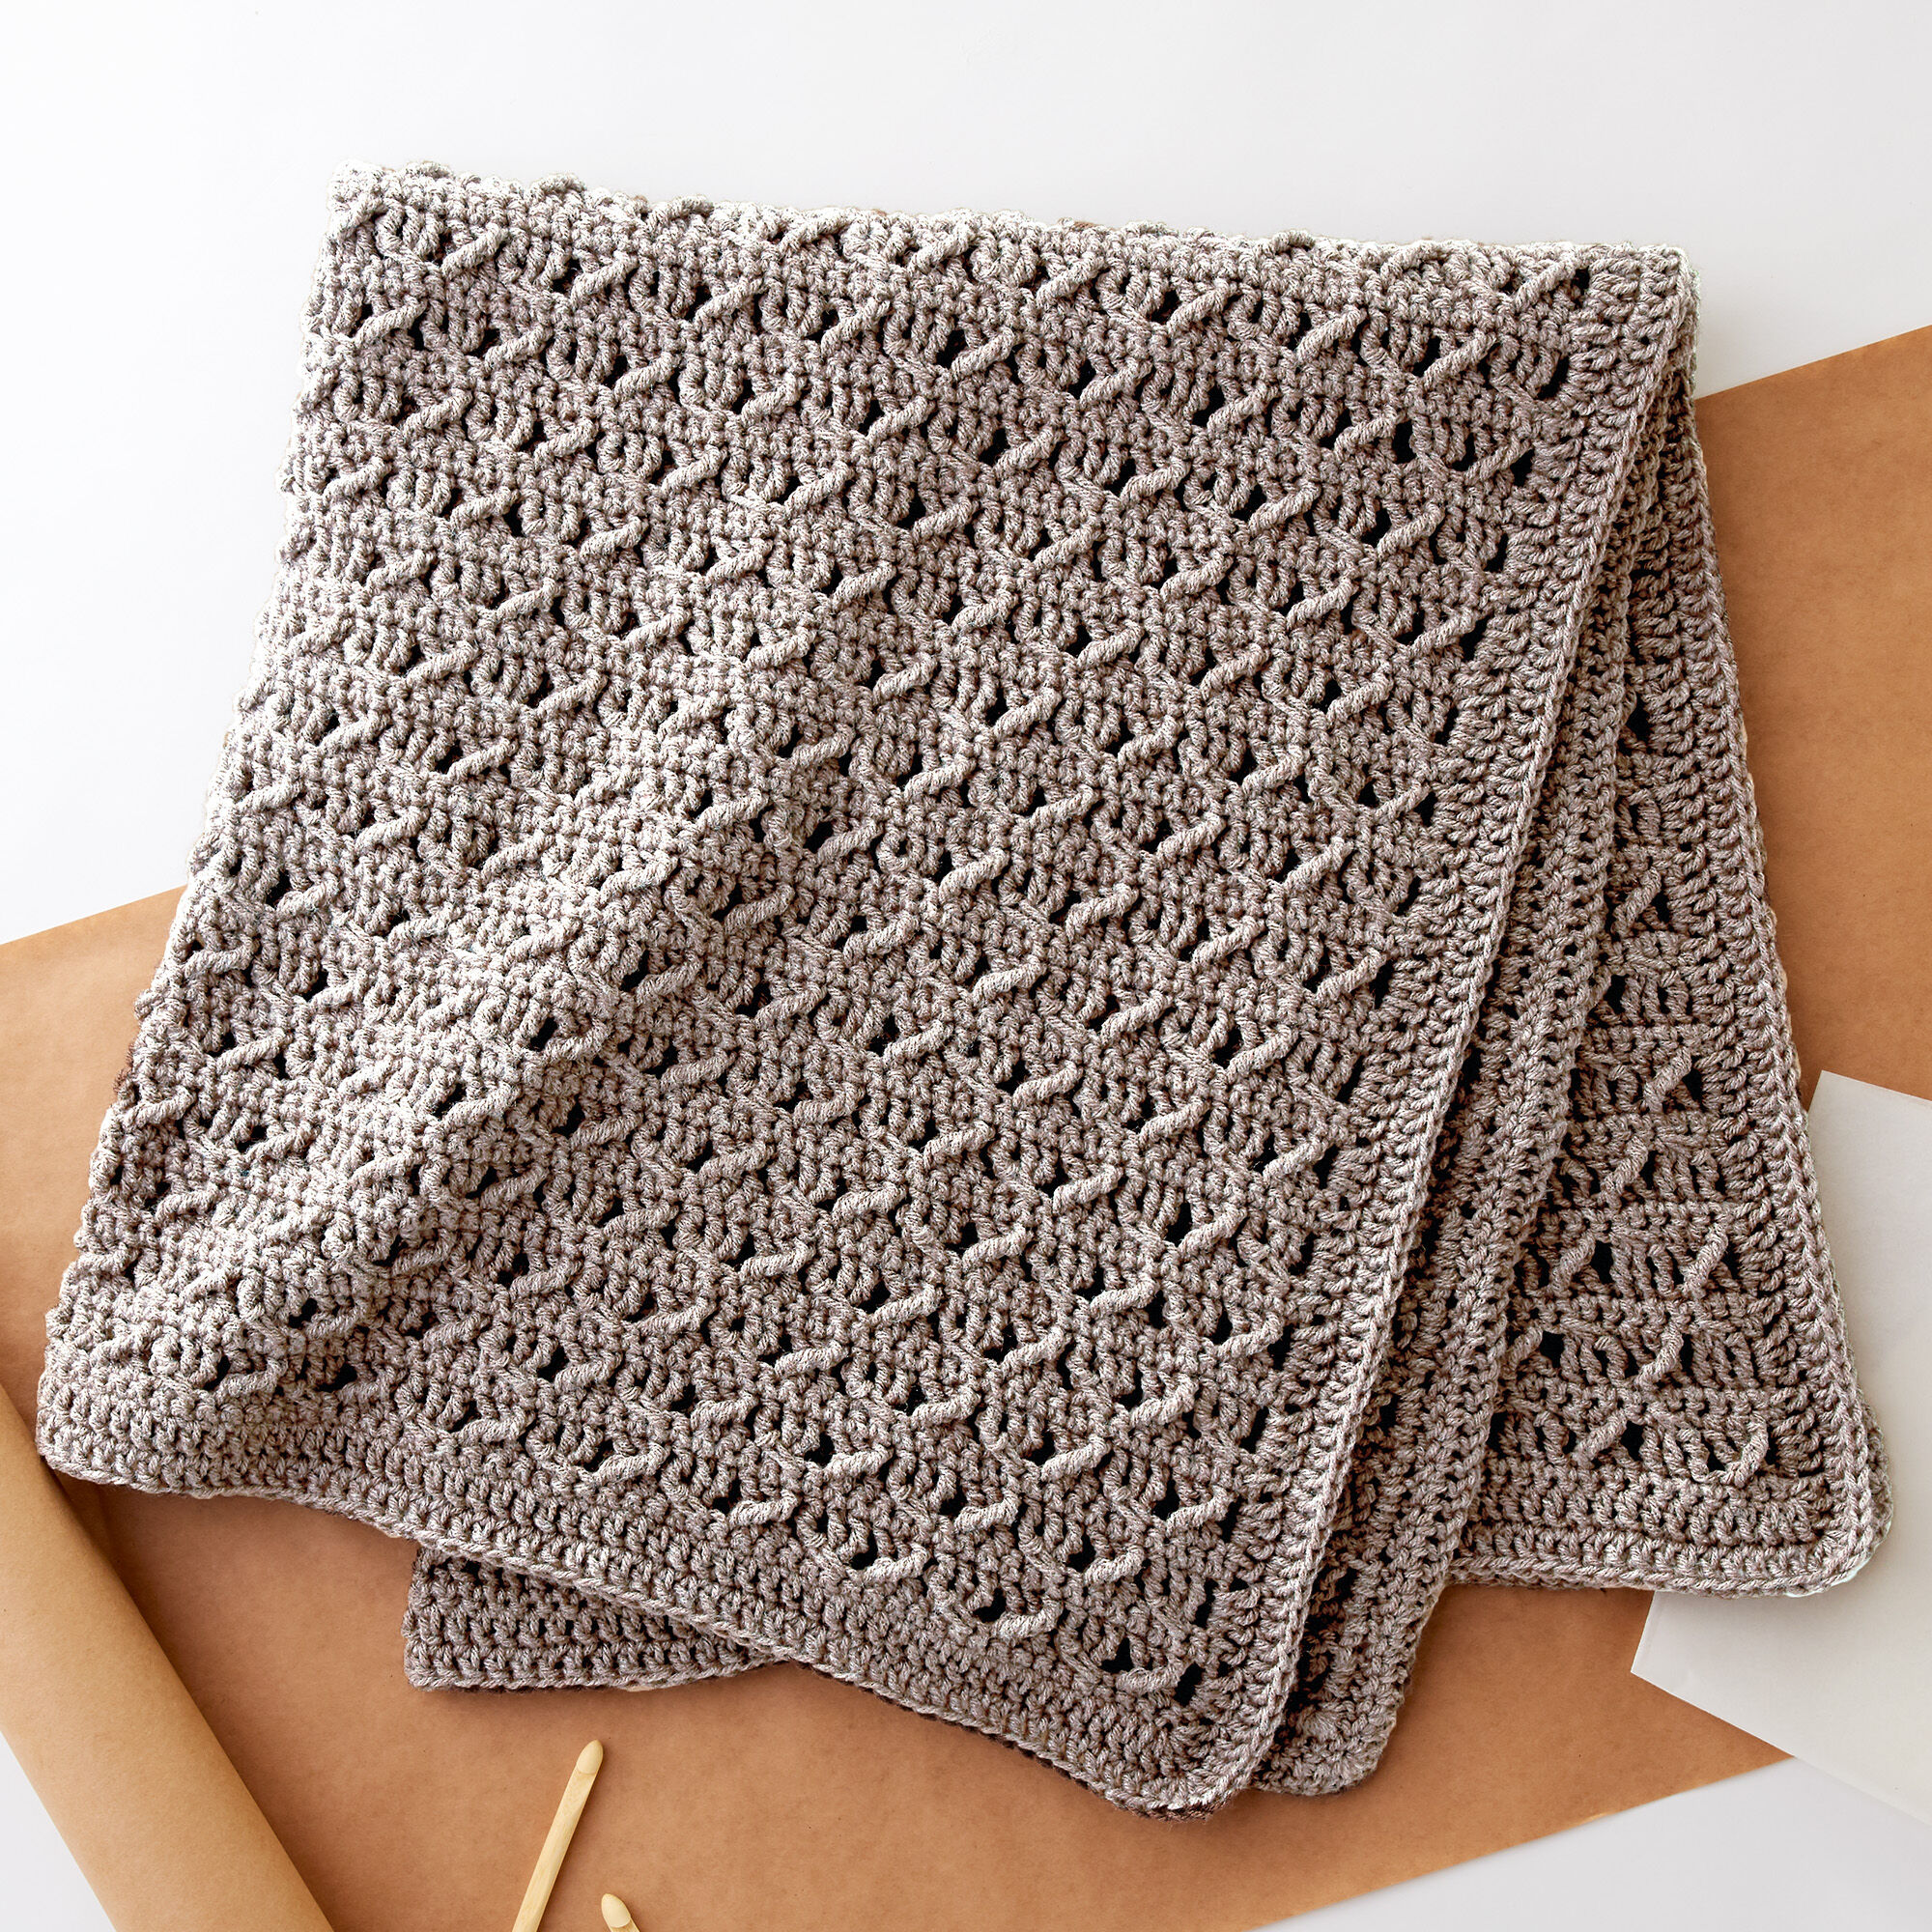 Lattice Weave Throw, free pattern (LW2914) by - Knit & Share  |Diamond Trellis Pattern Red Heart